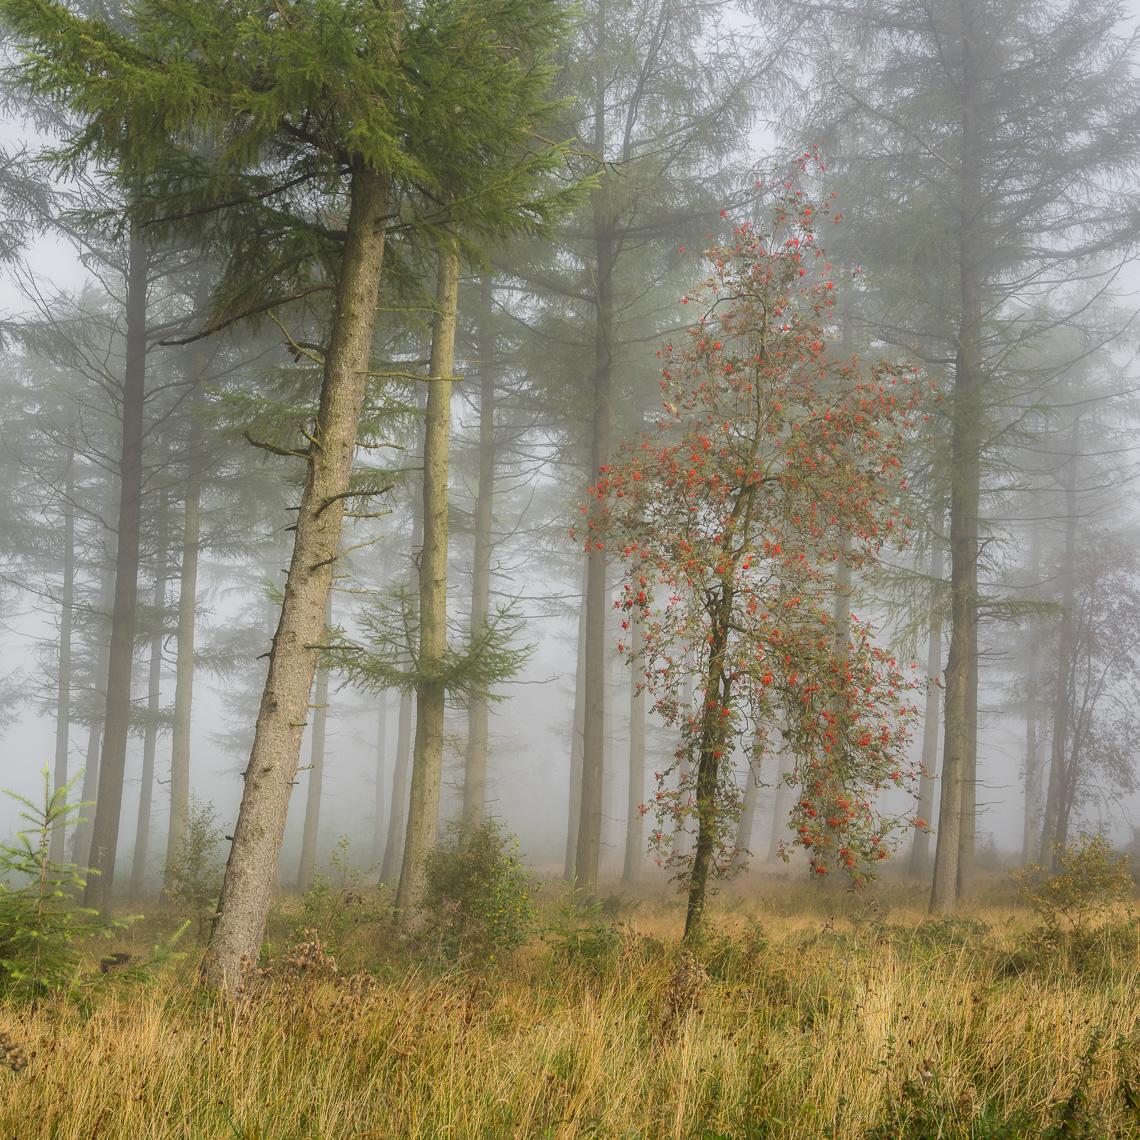 Early autumn rowan tree berries